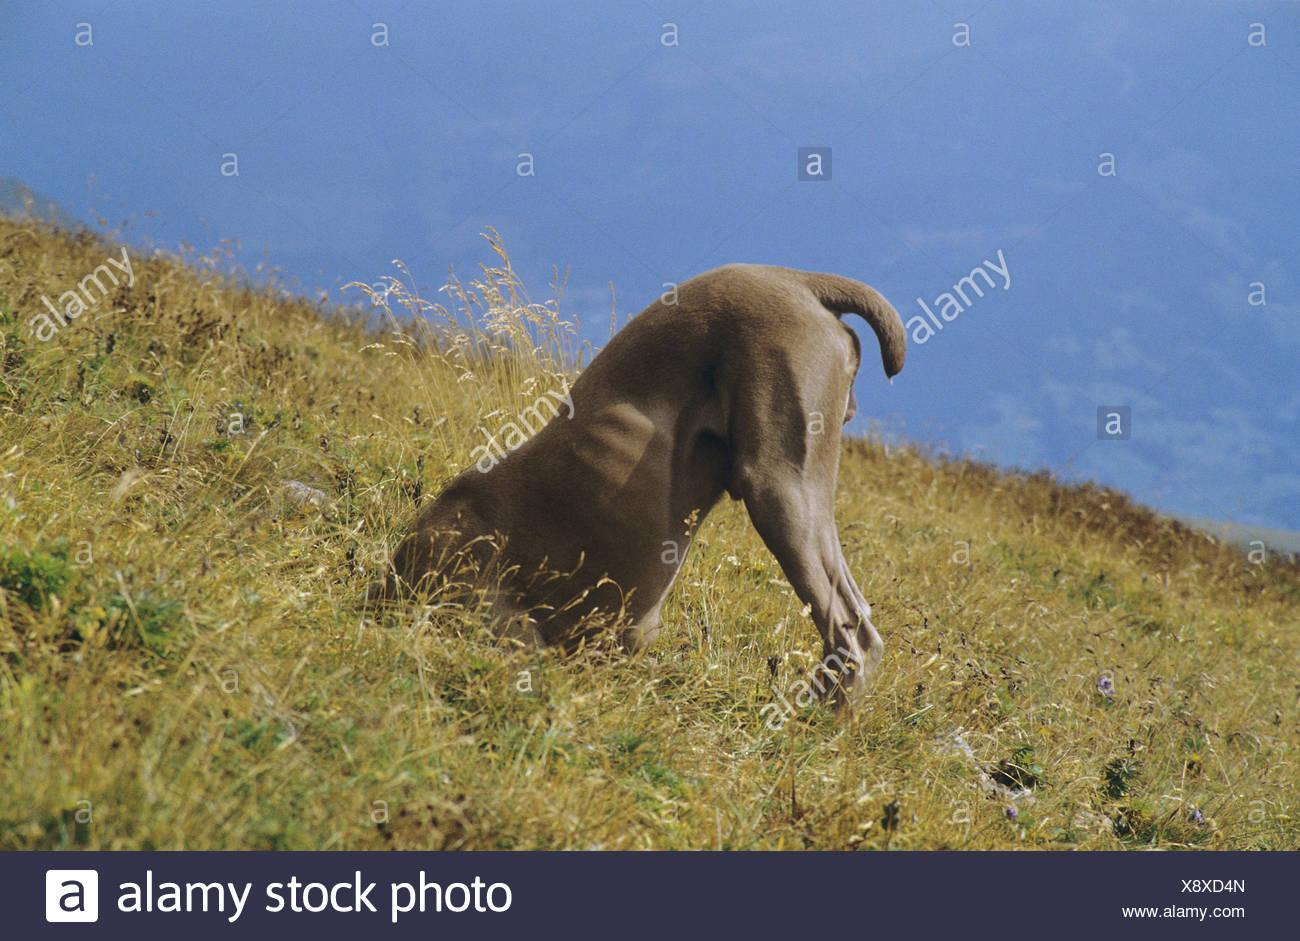 The Black Dog Scarborough